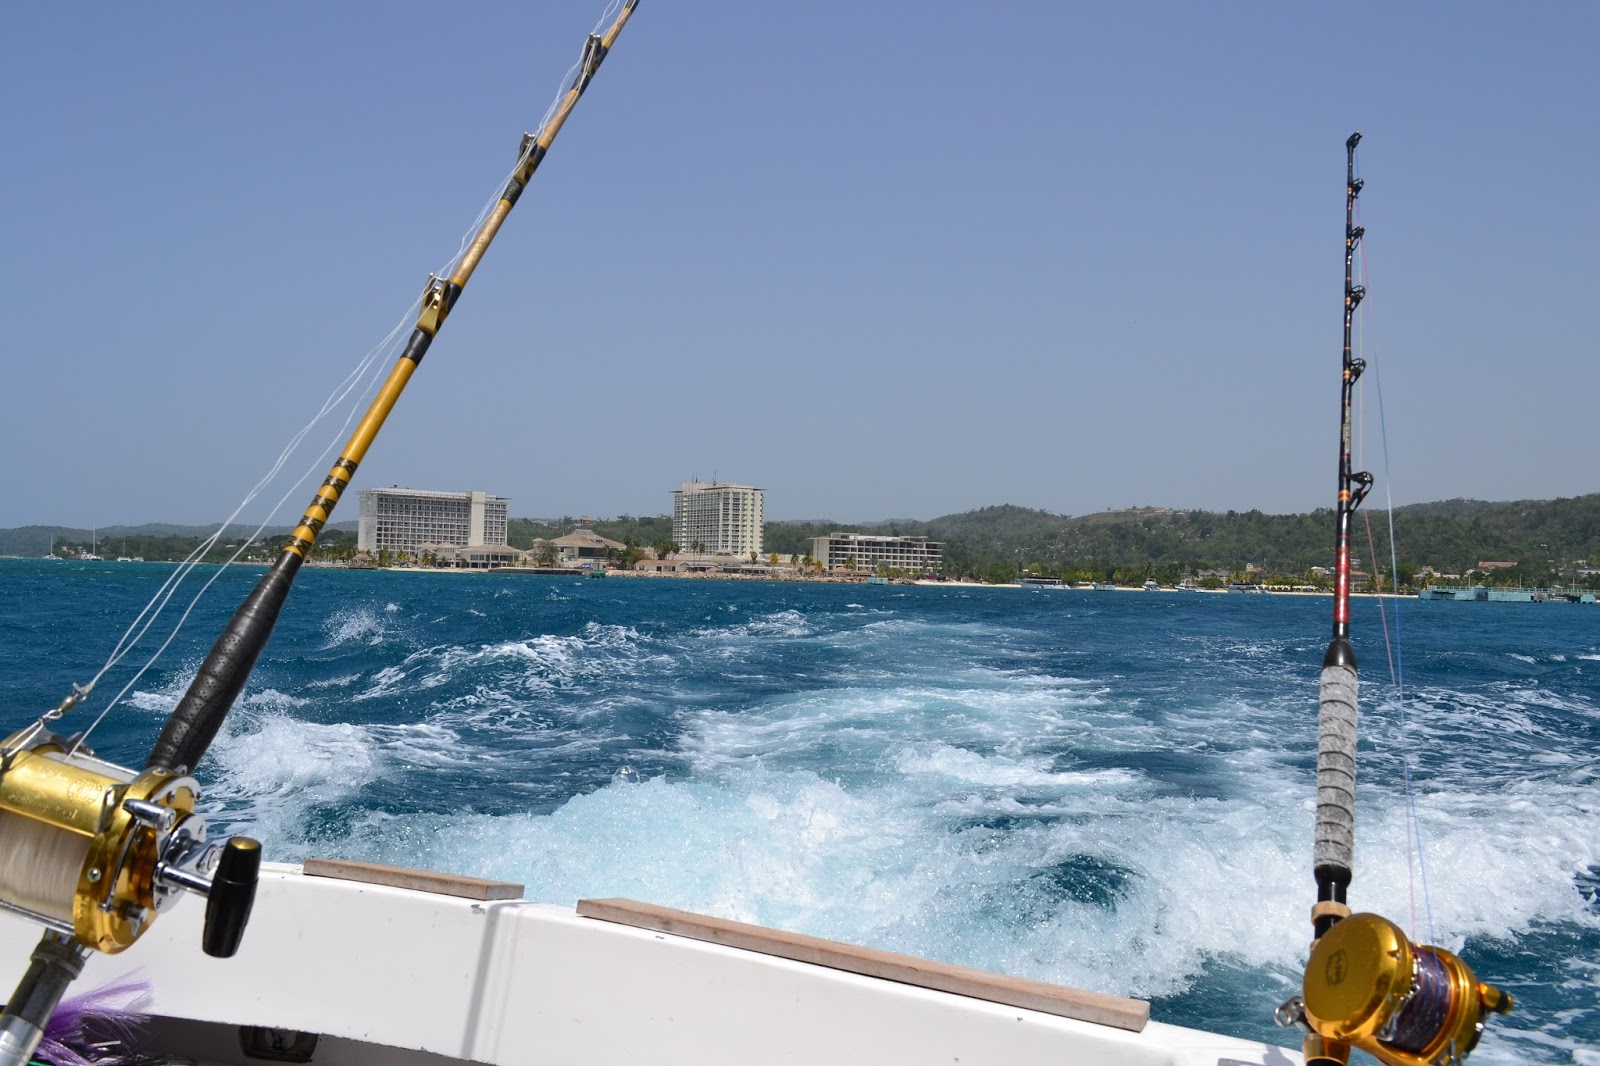 Jamaica deep sea fishing well worn suitcase for Deep sea fishing jamaica